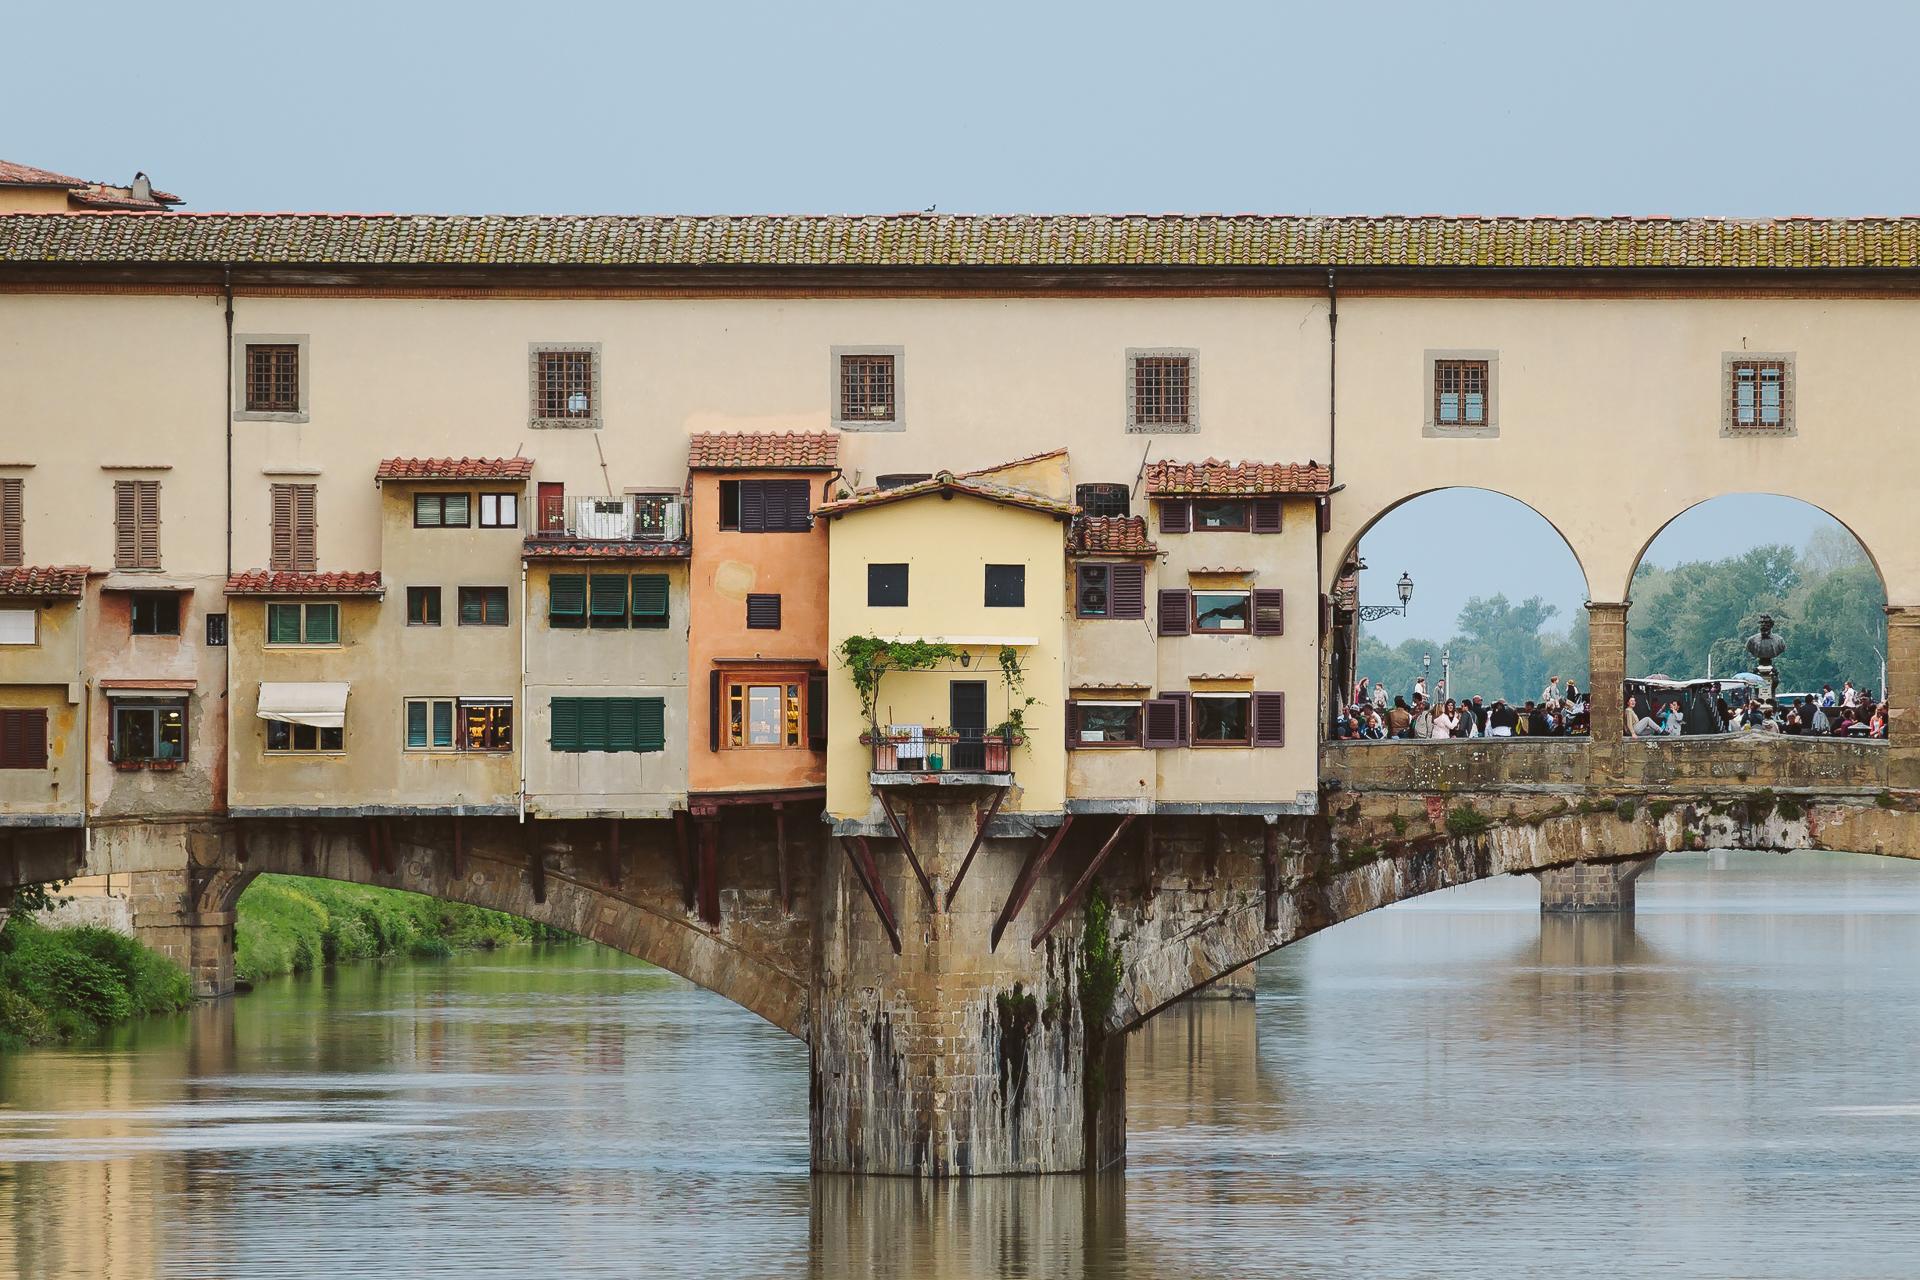 Ponte Vecchio, Firenze, Florance, Toscana, Tuscany